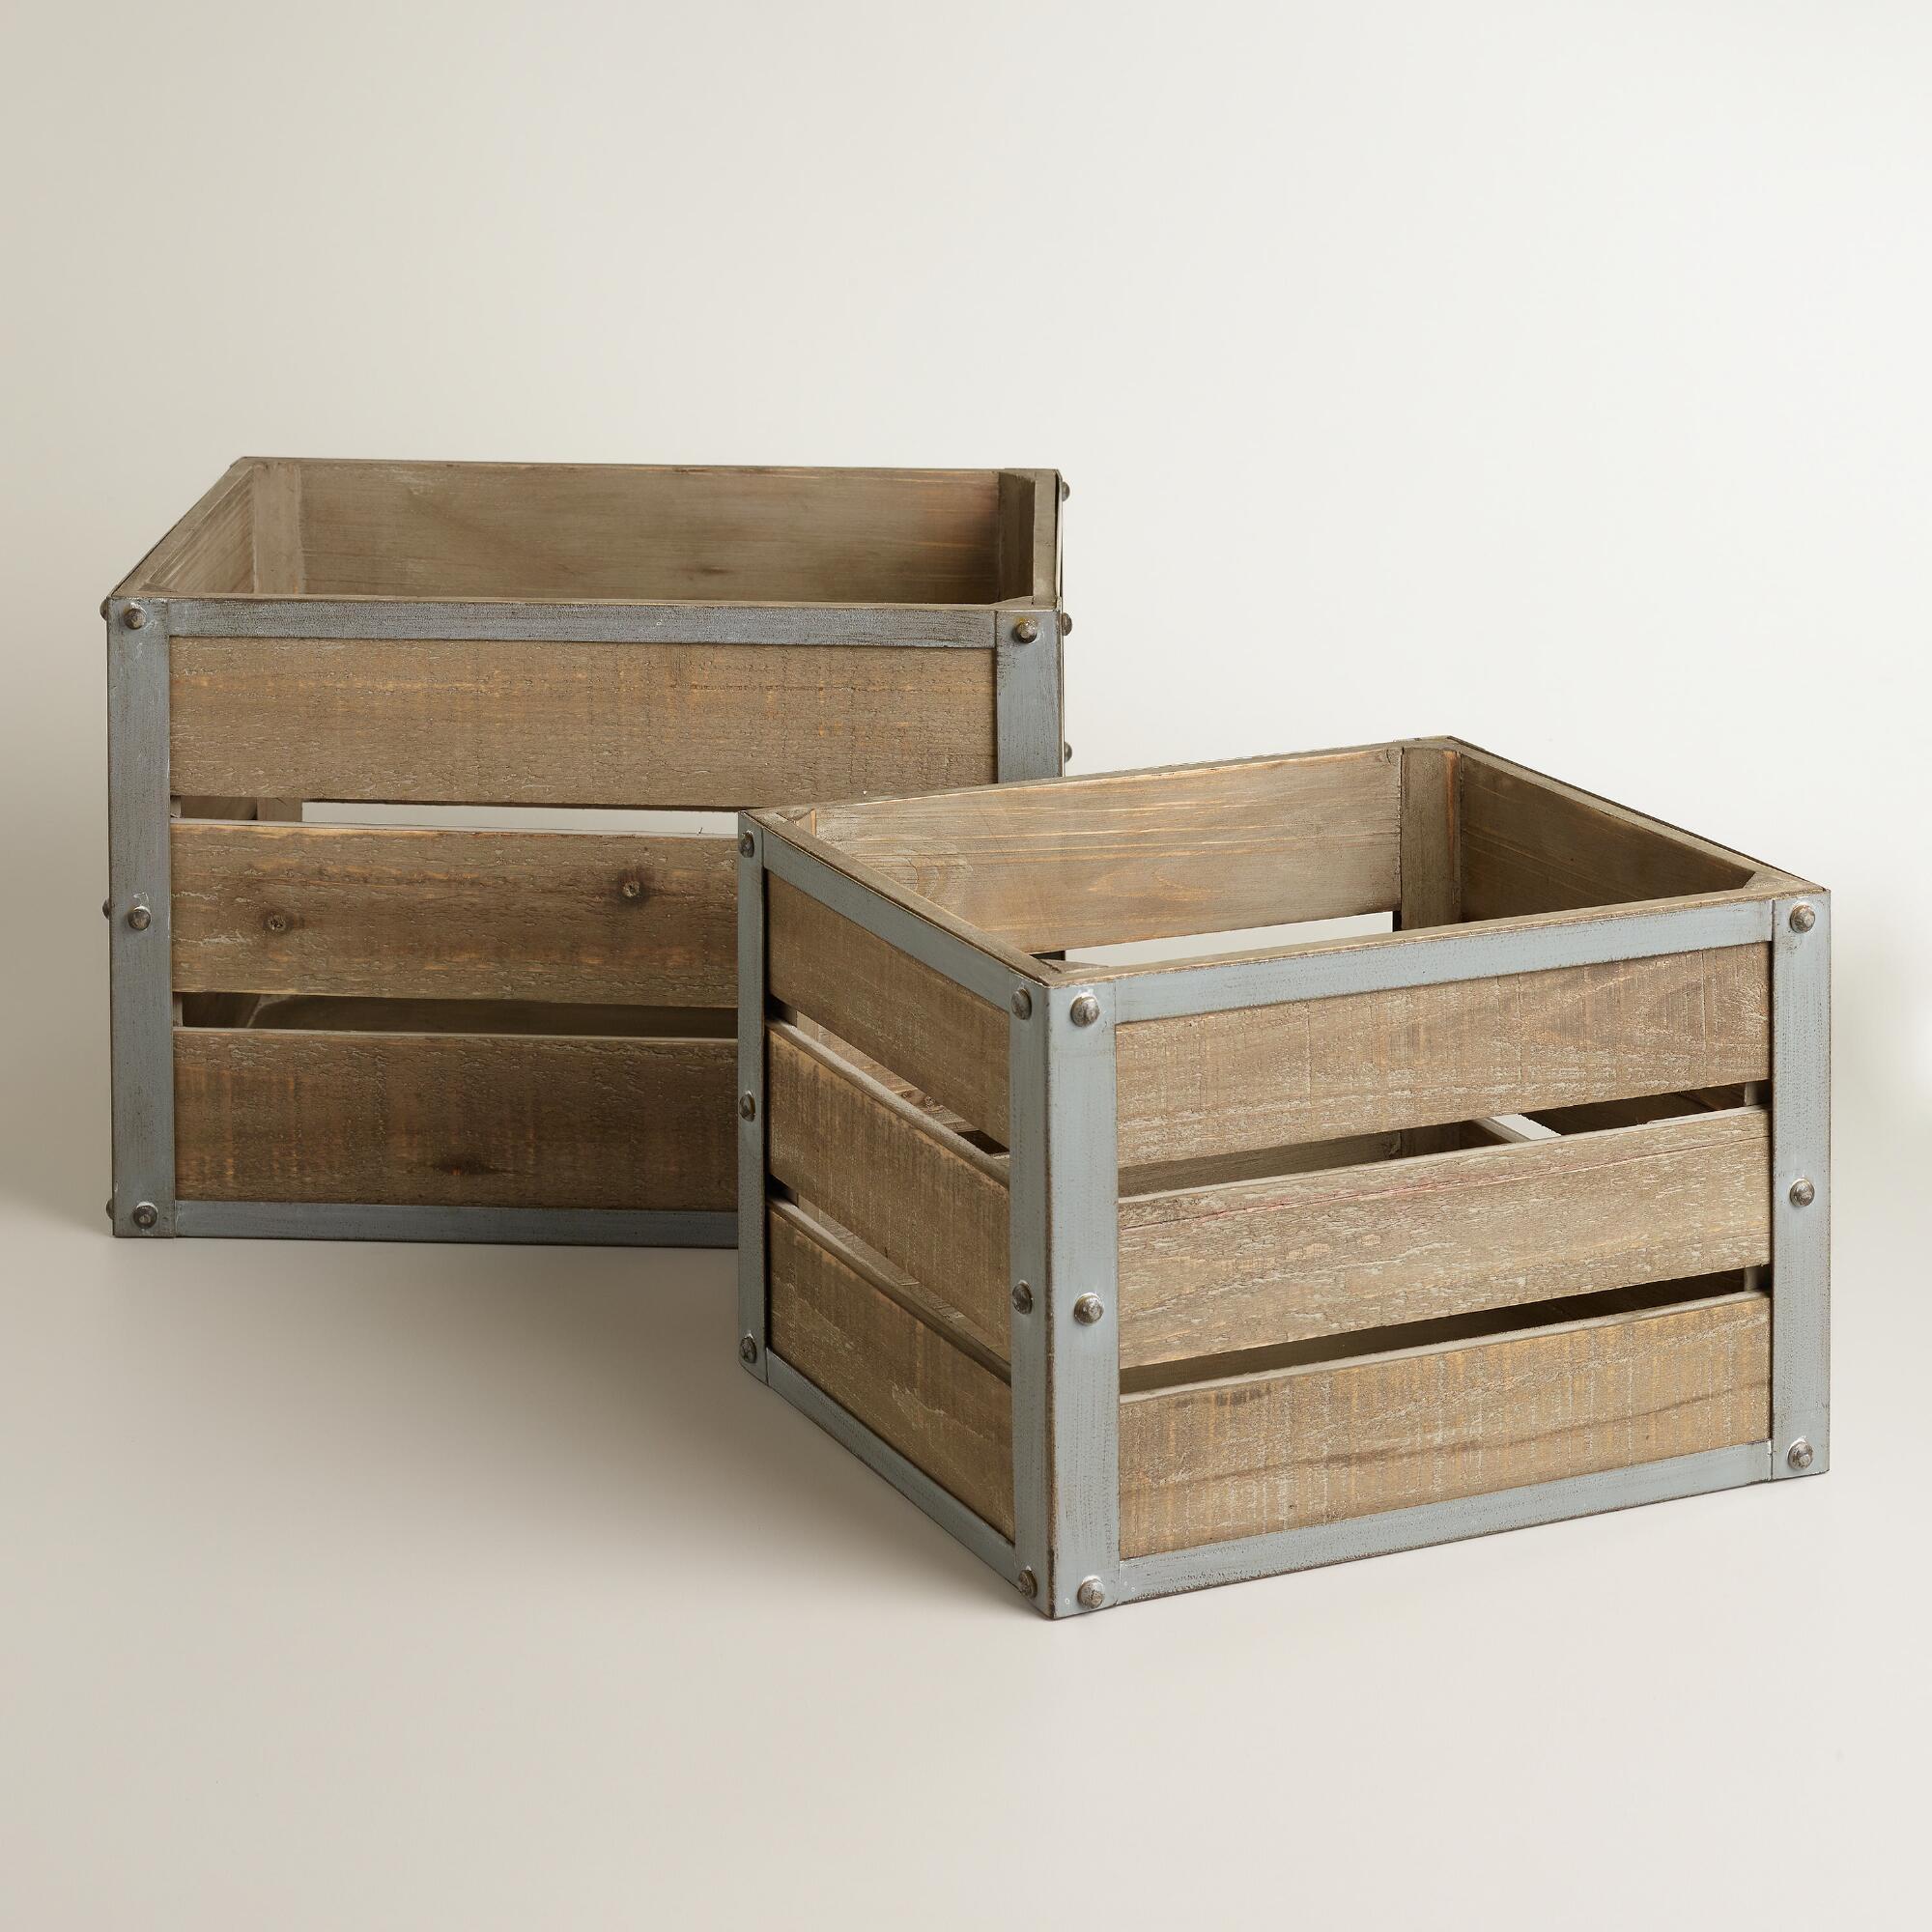 sebastian crates WM